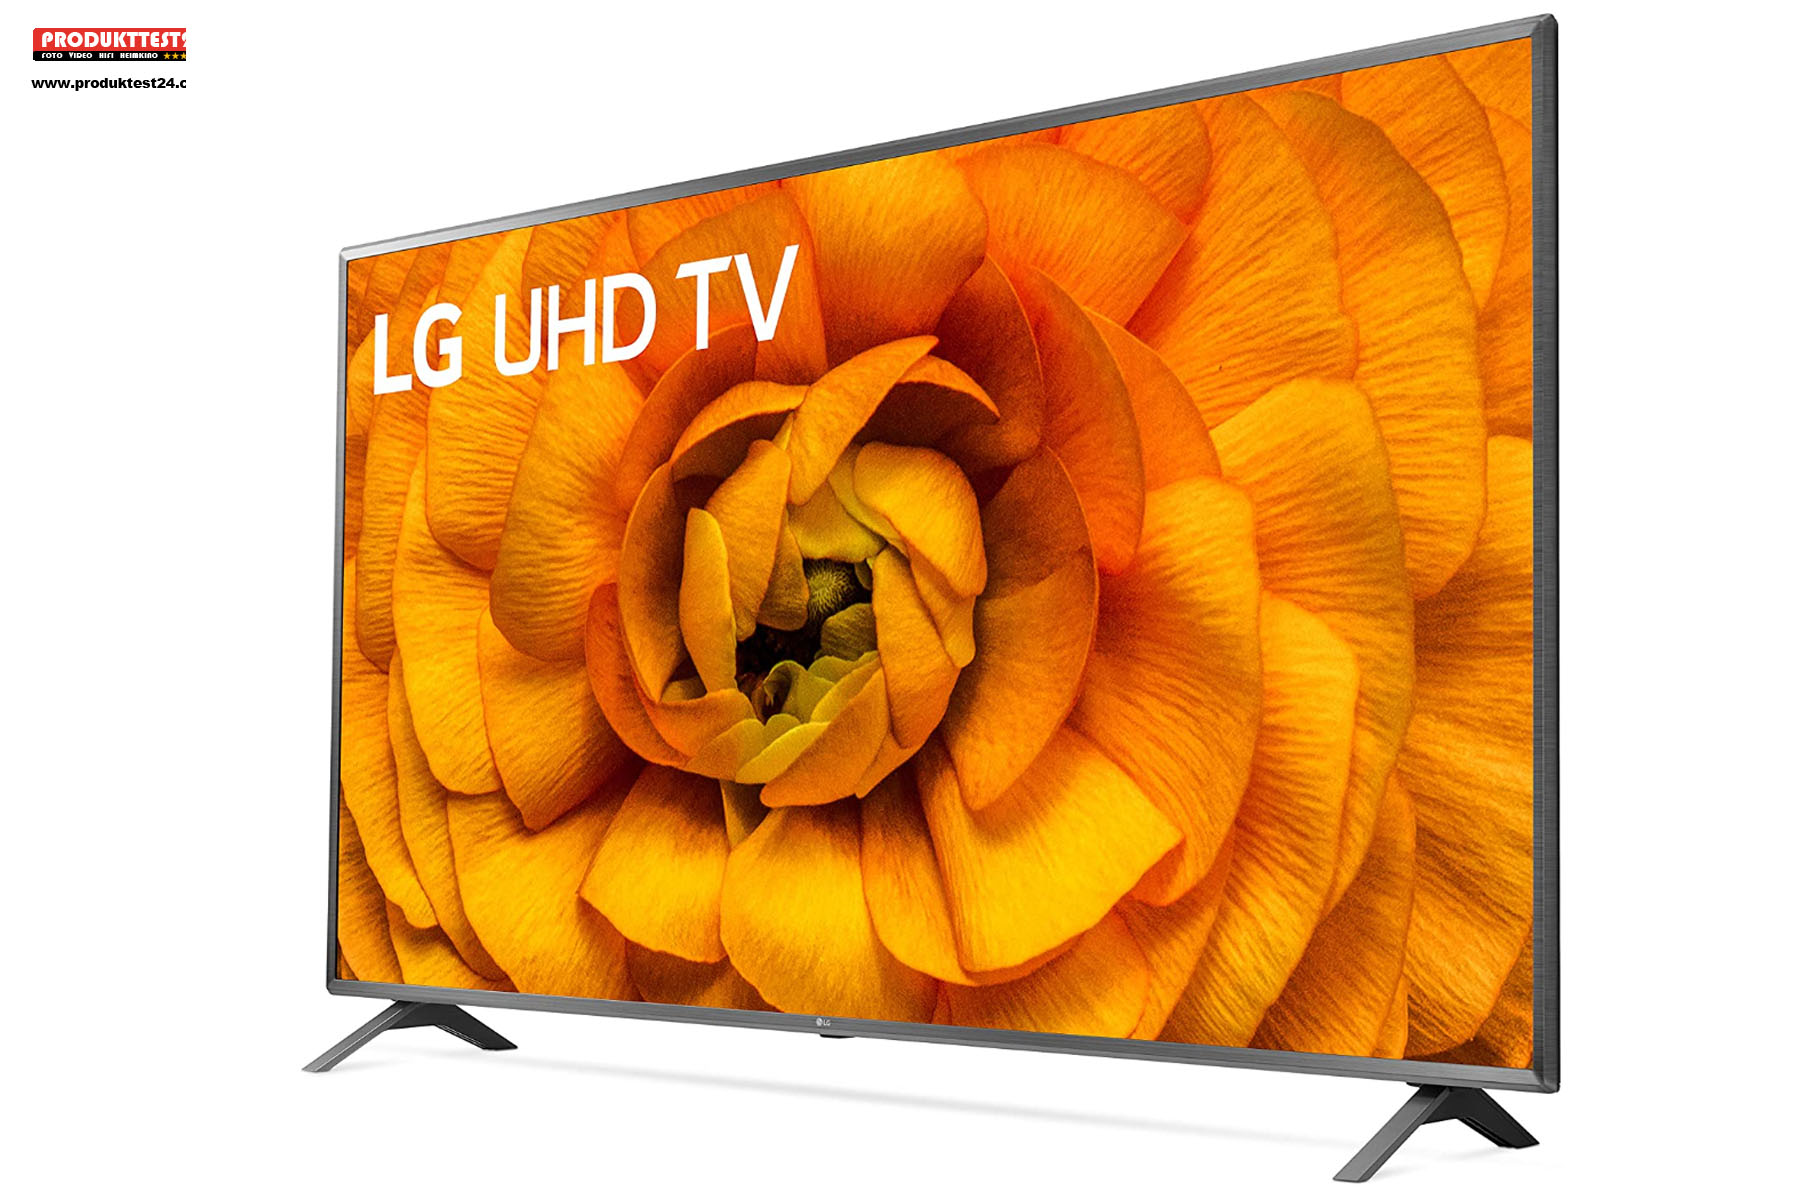 LG 82UN8500 - 82 Zoll Bilddiagonale (207 cm) mit HDR10 und Dolby Vision IQ